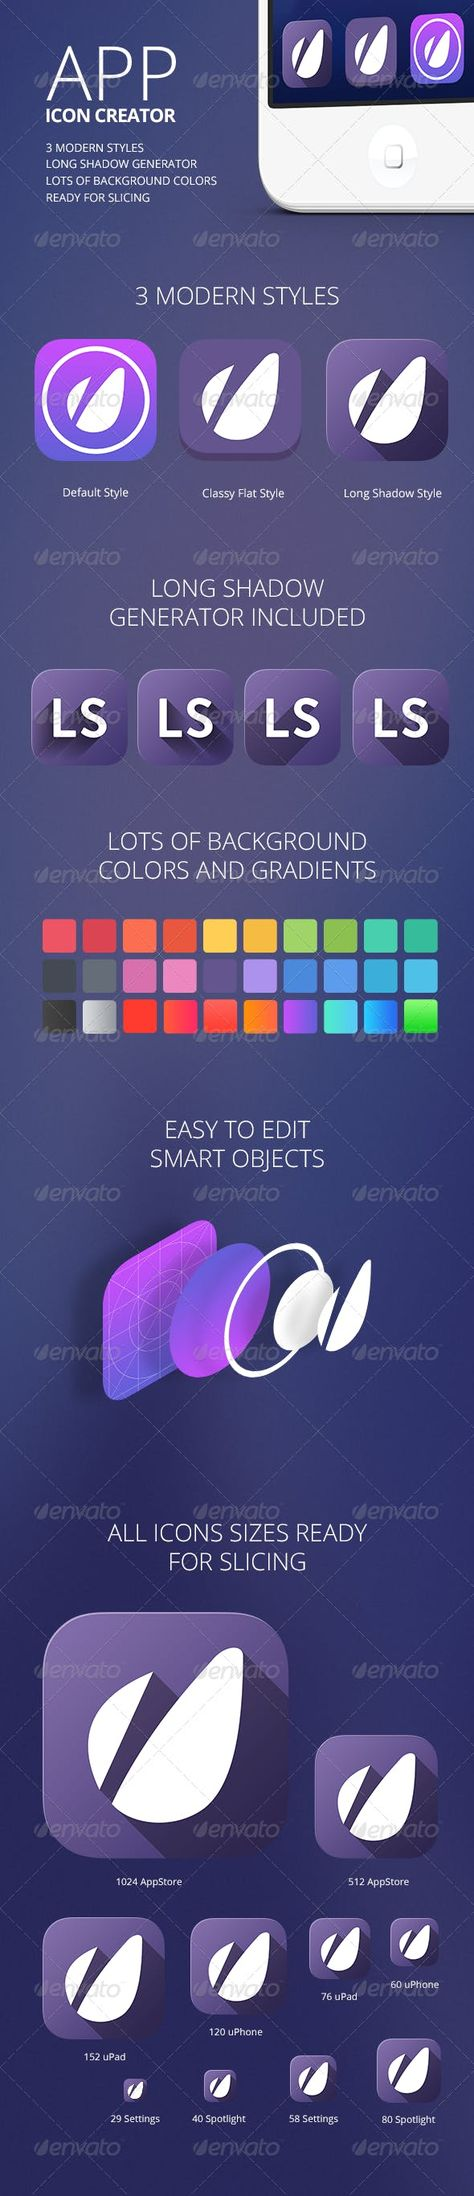 App Icon Creator with Flat Shadow Generator App icon